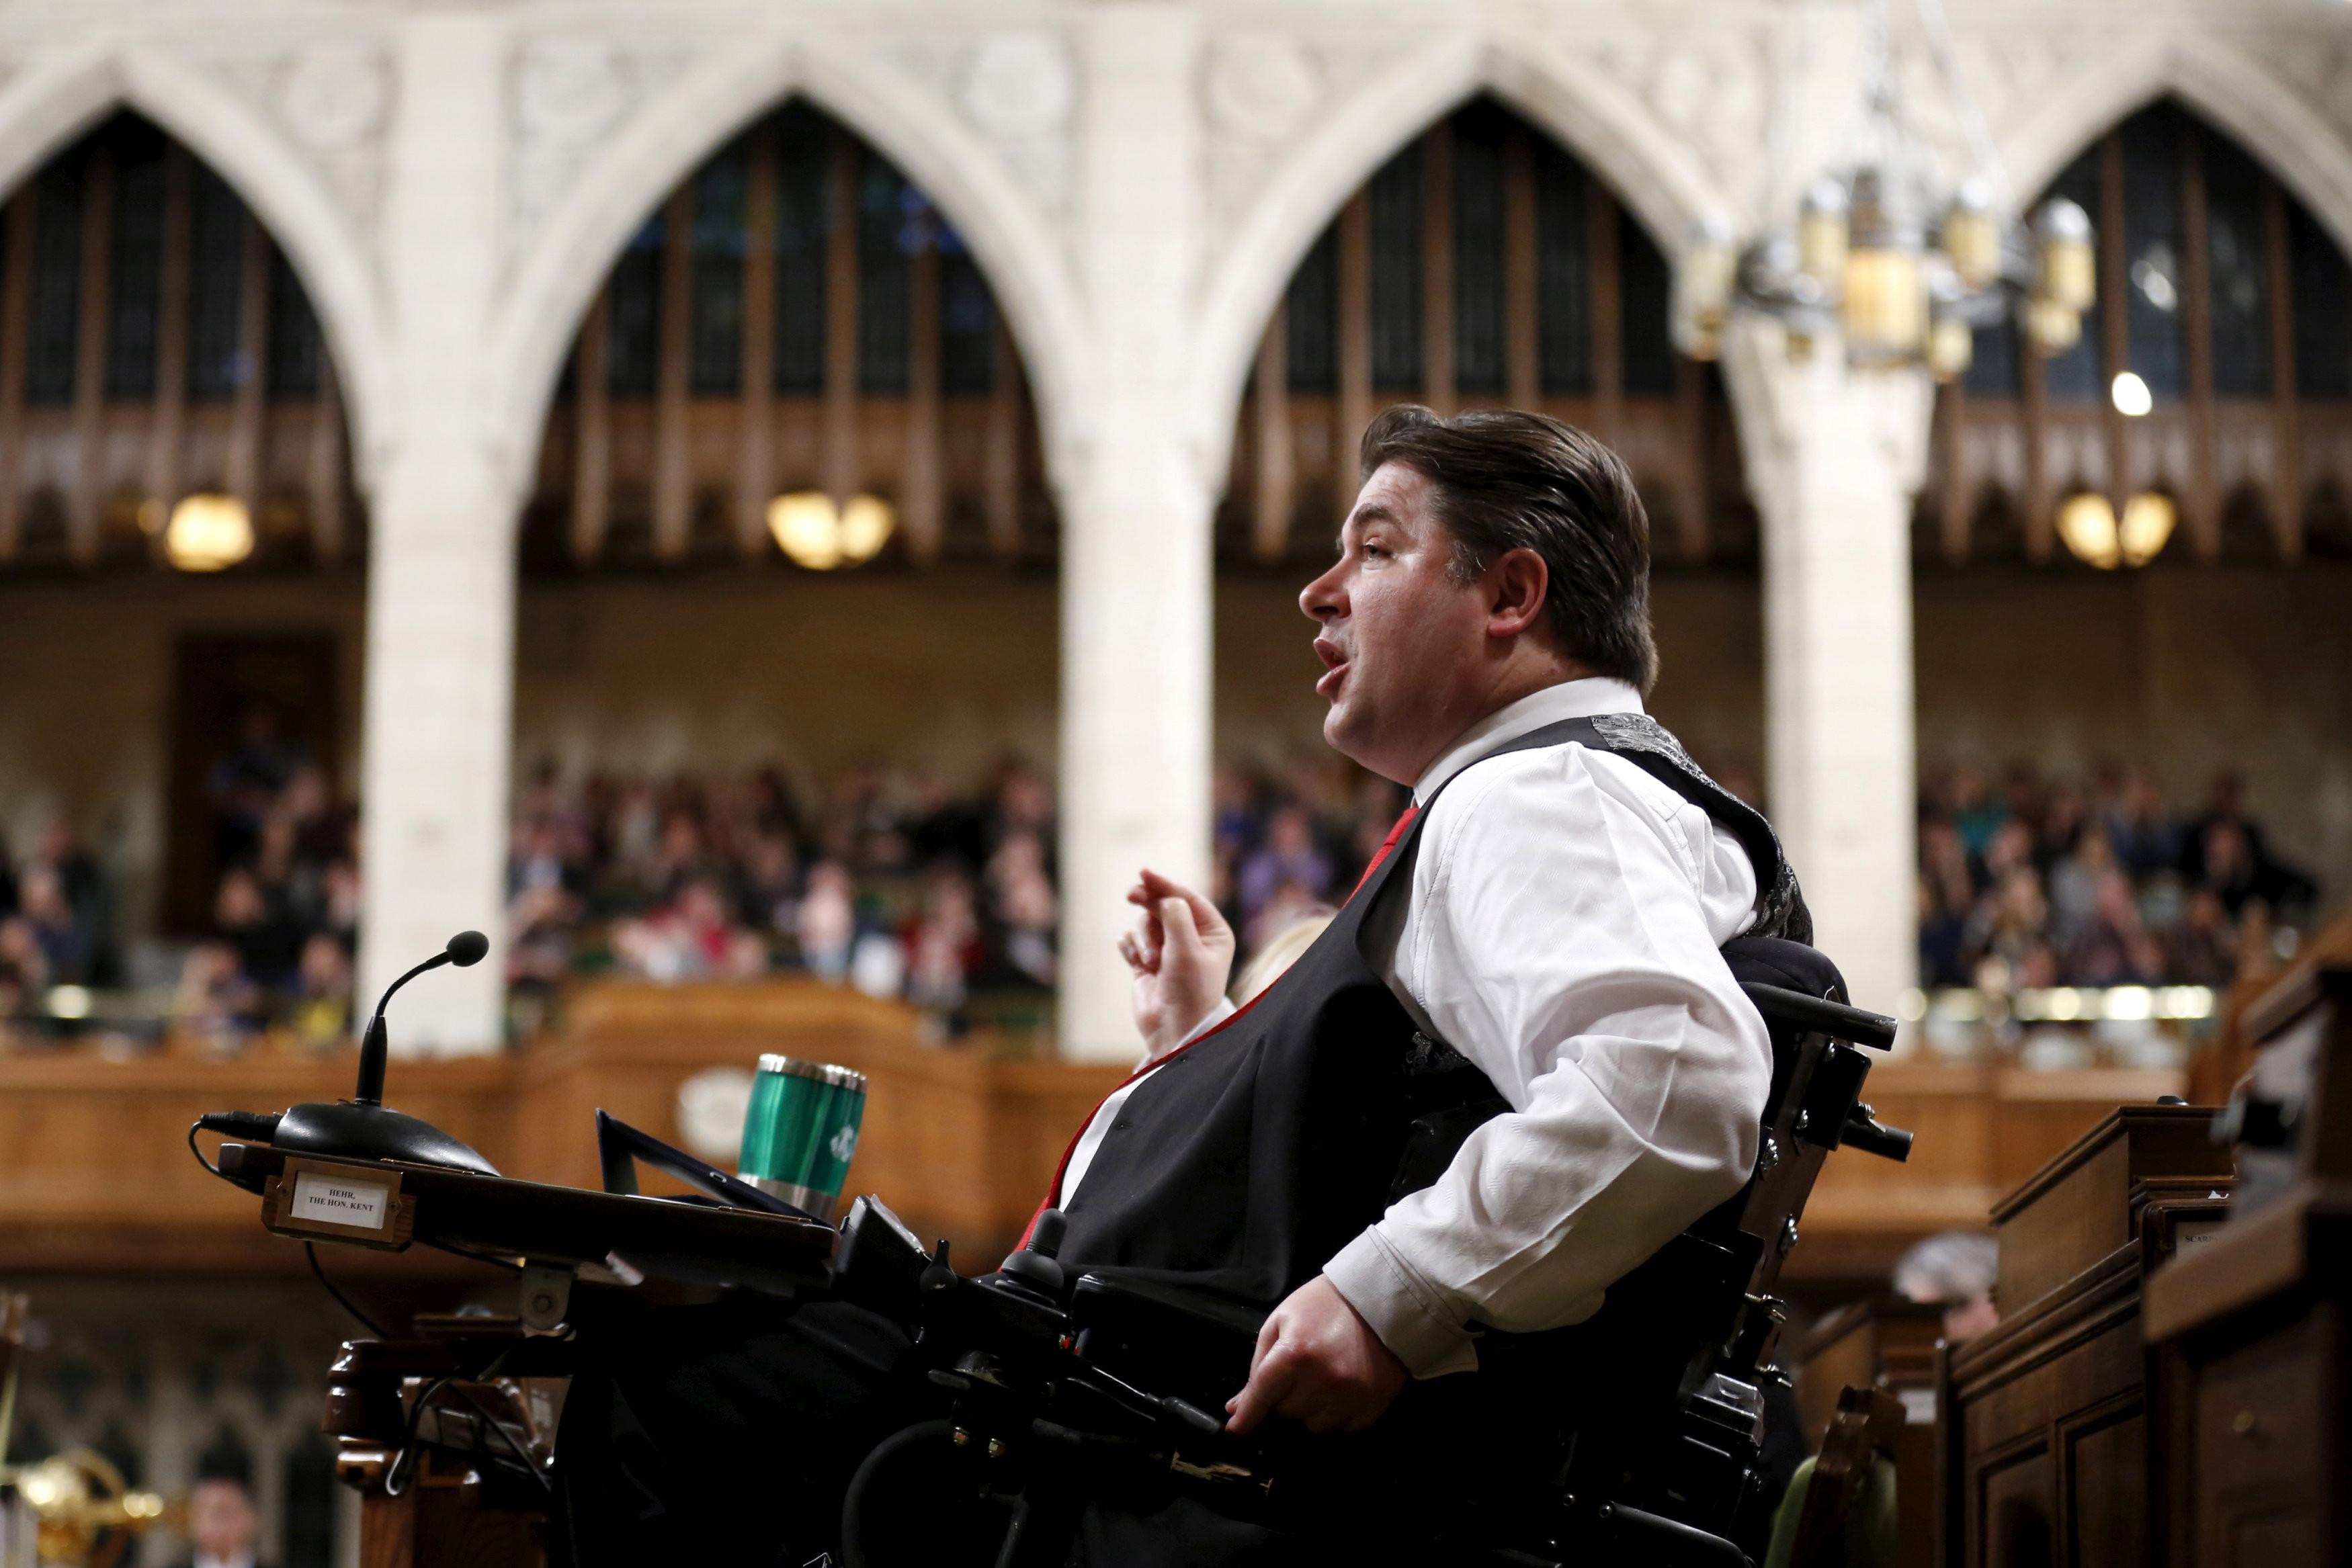 <p>Министр спорта Канады Кент Хейр. Фото: &copy; REUTERS/Chris Wattie</p>